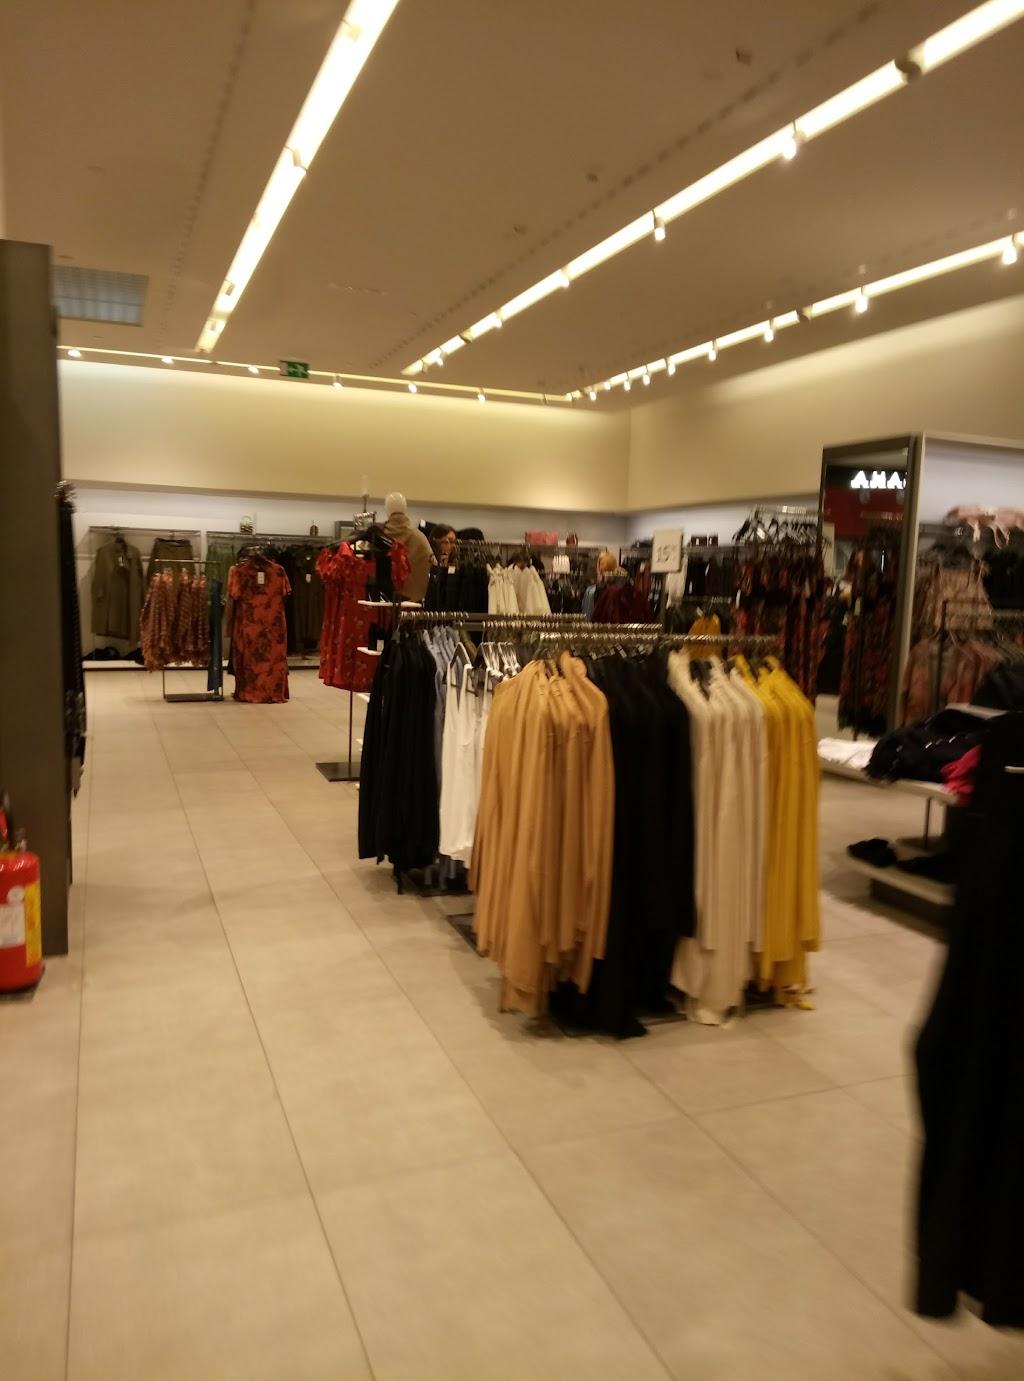 ZARA (Centro Commerciale Conca D'Oro), Palermo </p>         </div>          <!--eof Product description -->      <!--bof Reviews button and count-->      <div class=